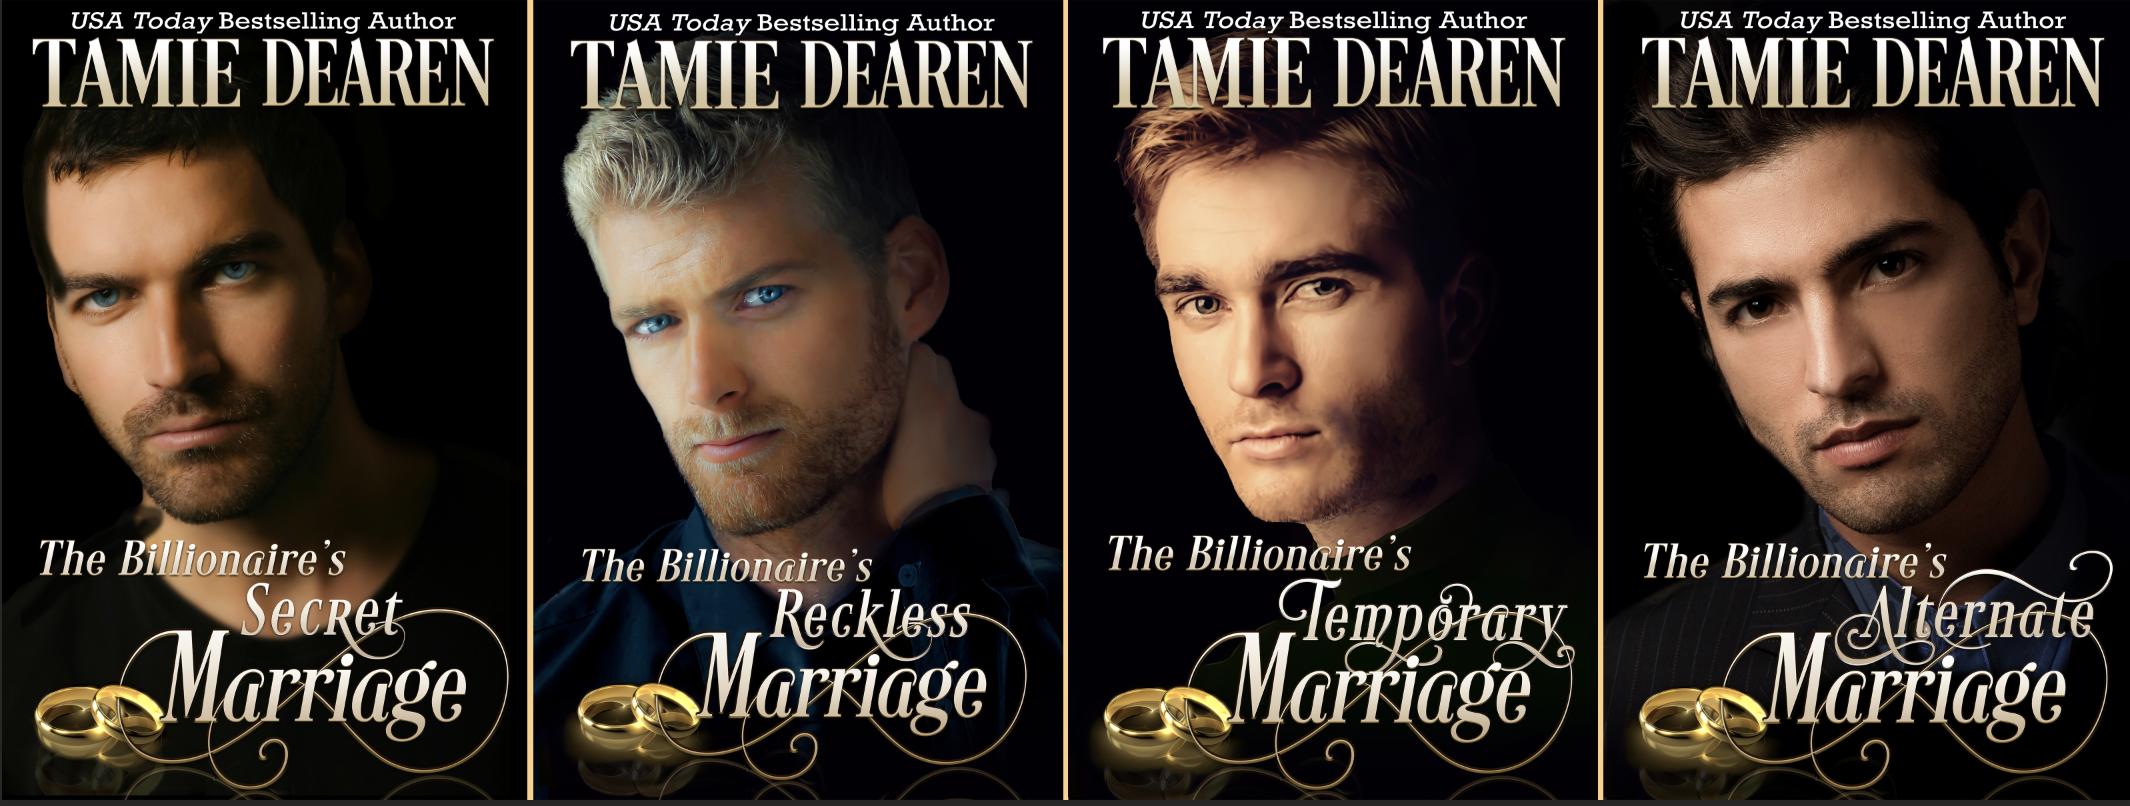 Limitless Billionaire Romance Series Tamie Dearen